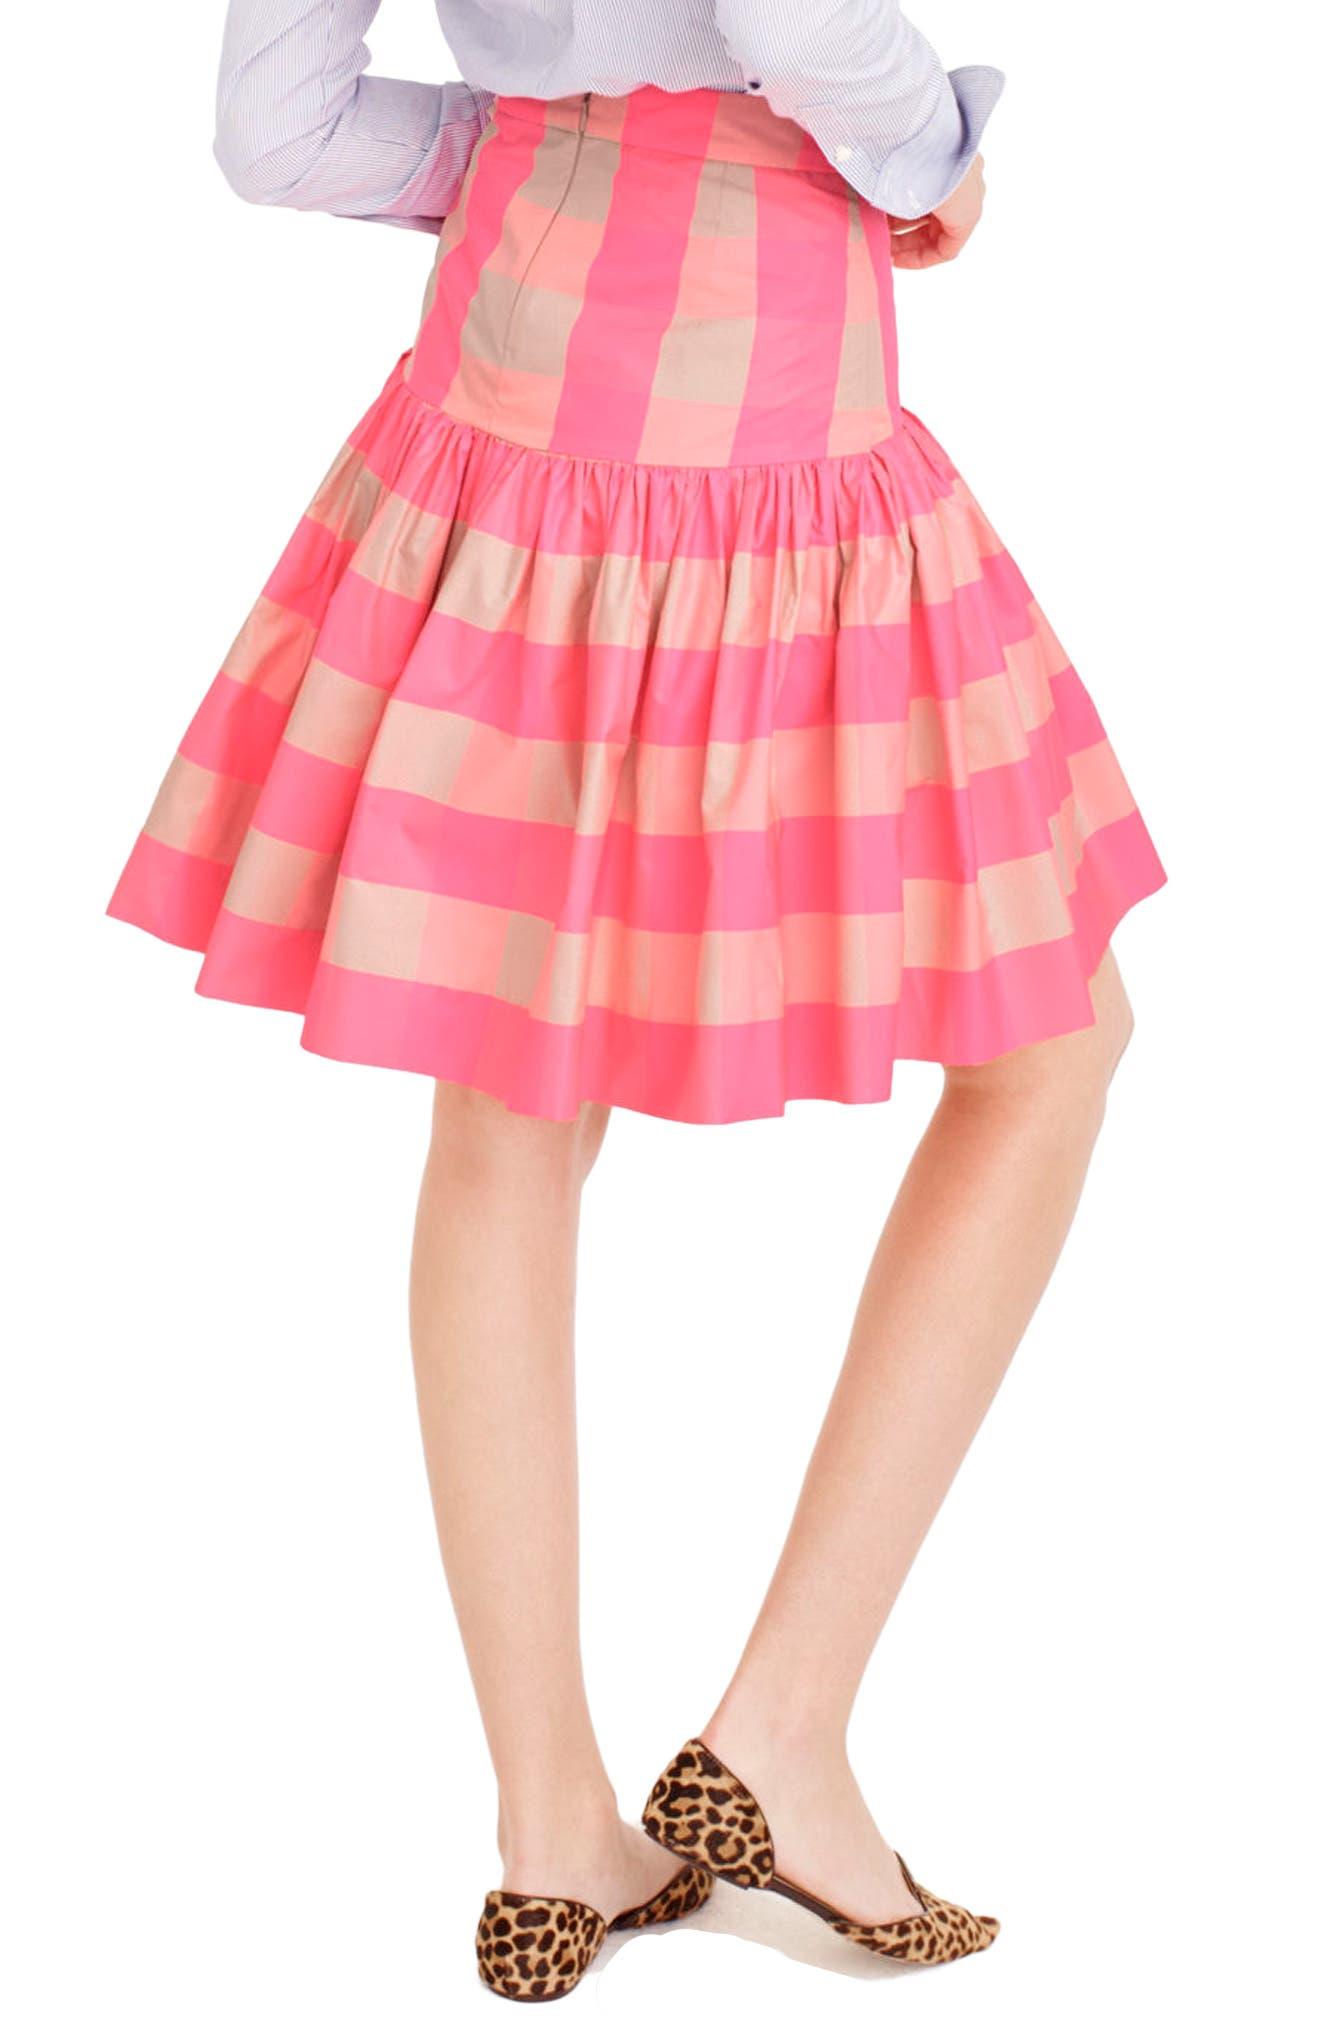 Neon Buffalo Check Taffeta Skirt,                             Alternate thumbnail 2, color,                             651